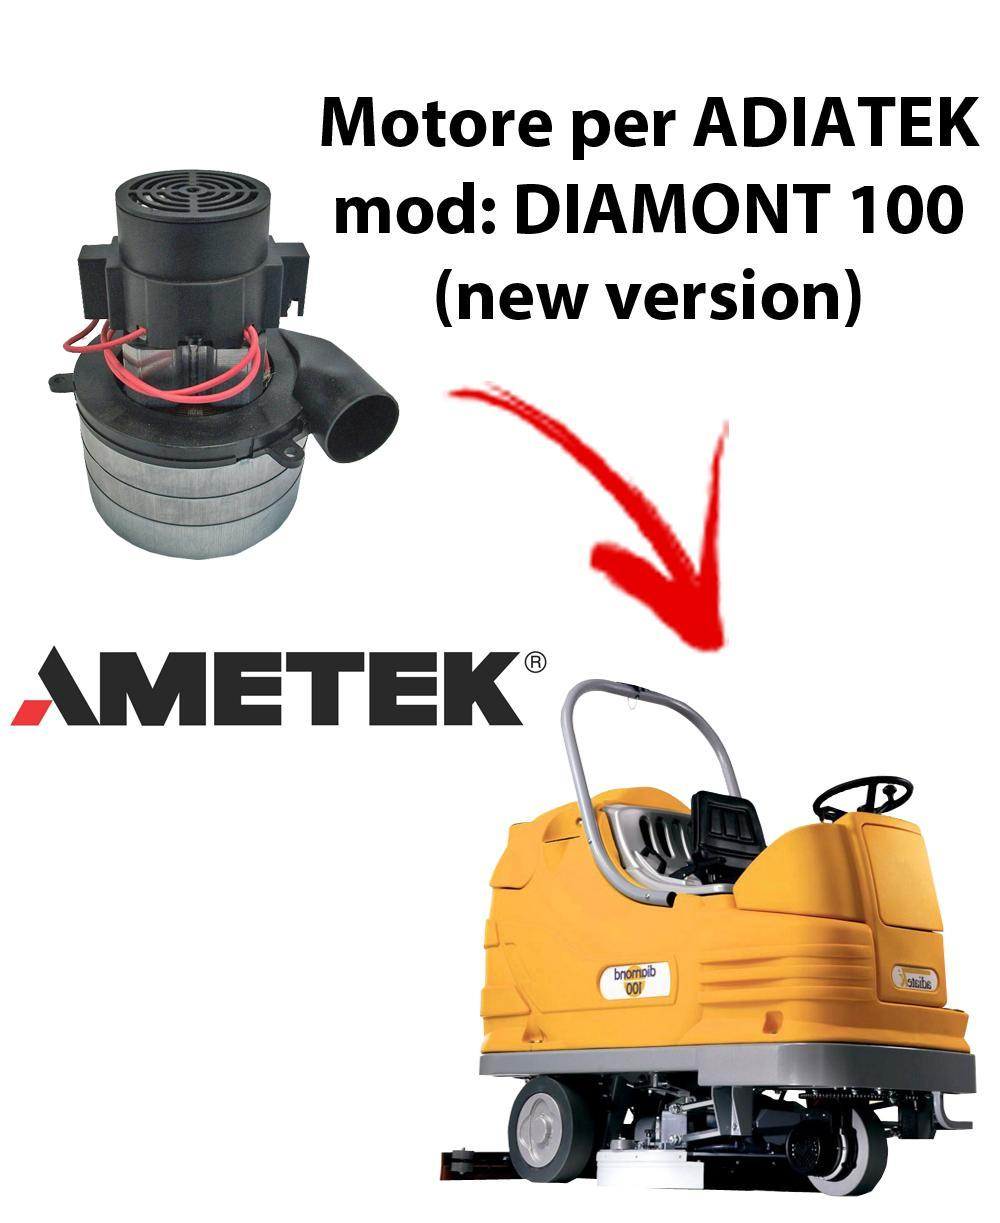 Diamond 100 (new version) Motore de aspiración Ametek Italia  para fregadora Adiatek